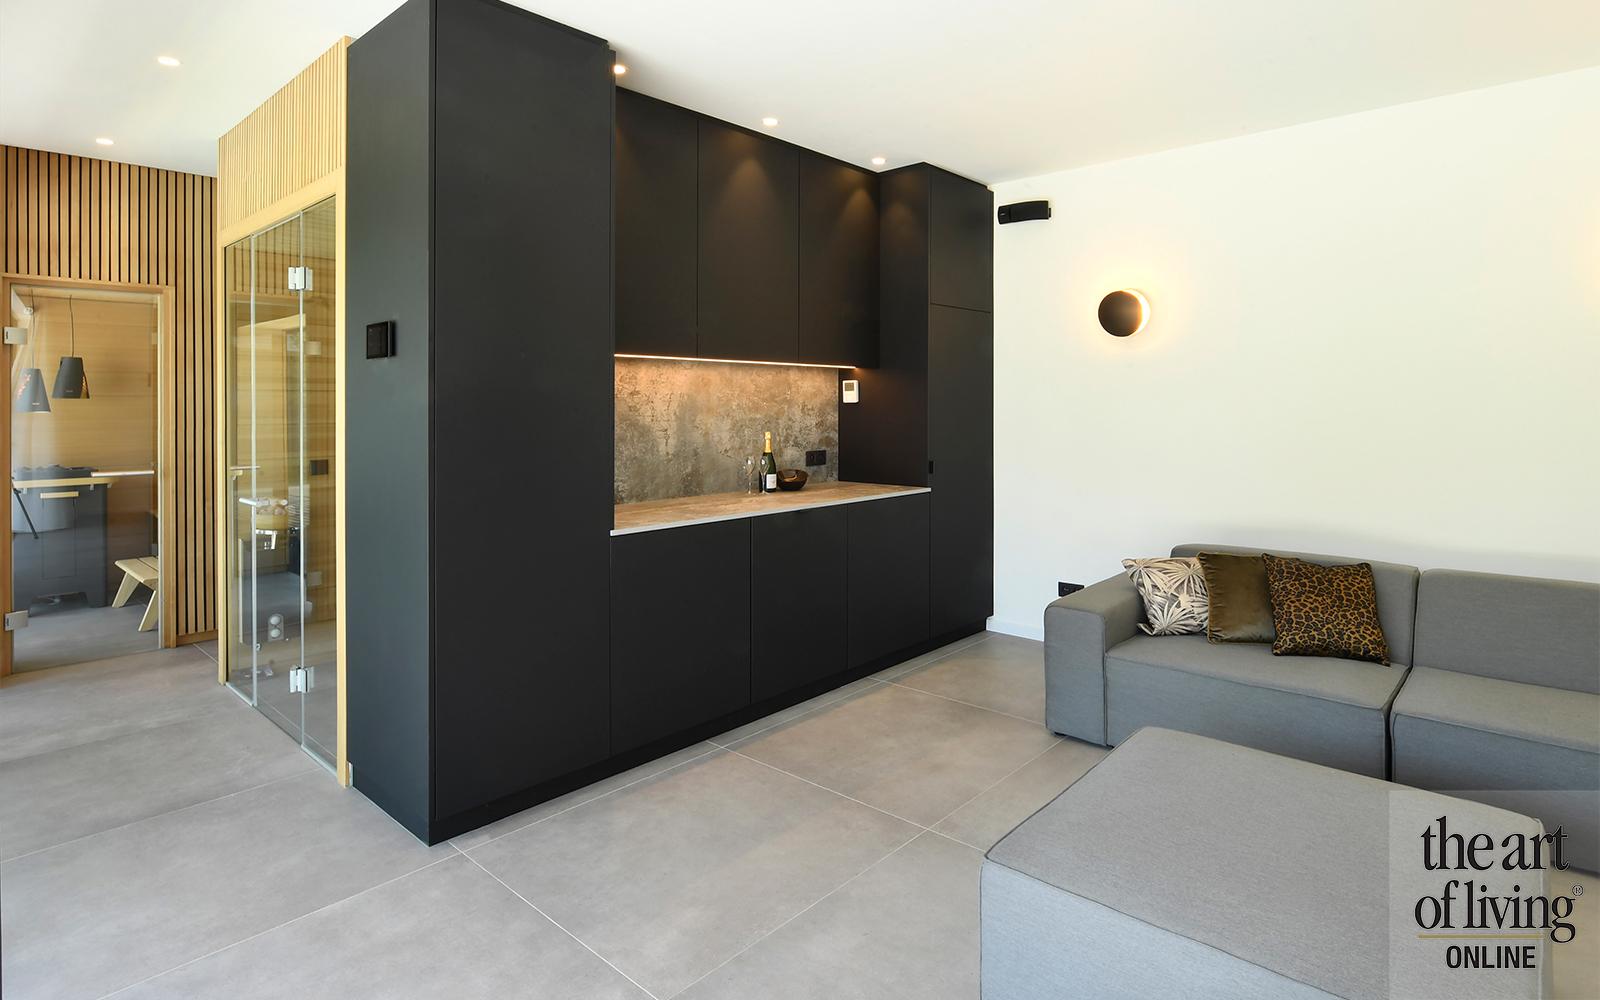 Modernevilla   Boxxis architecten, the art of living